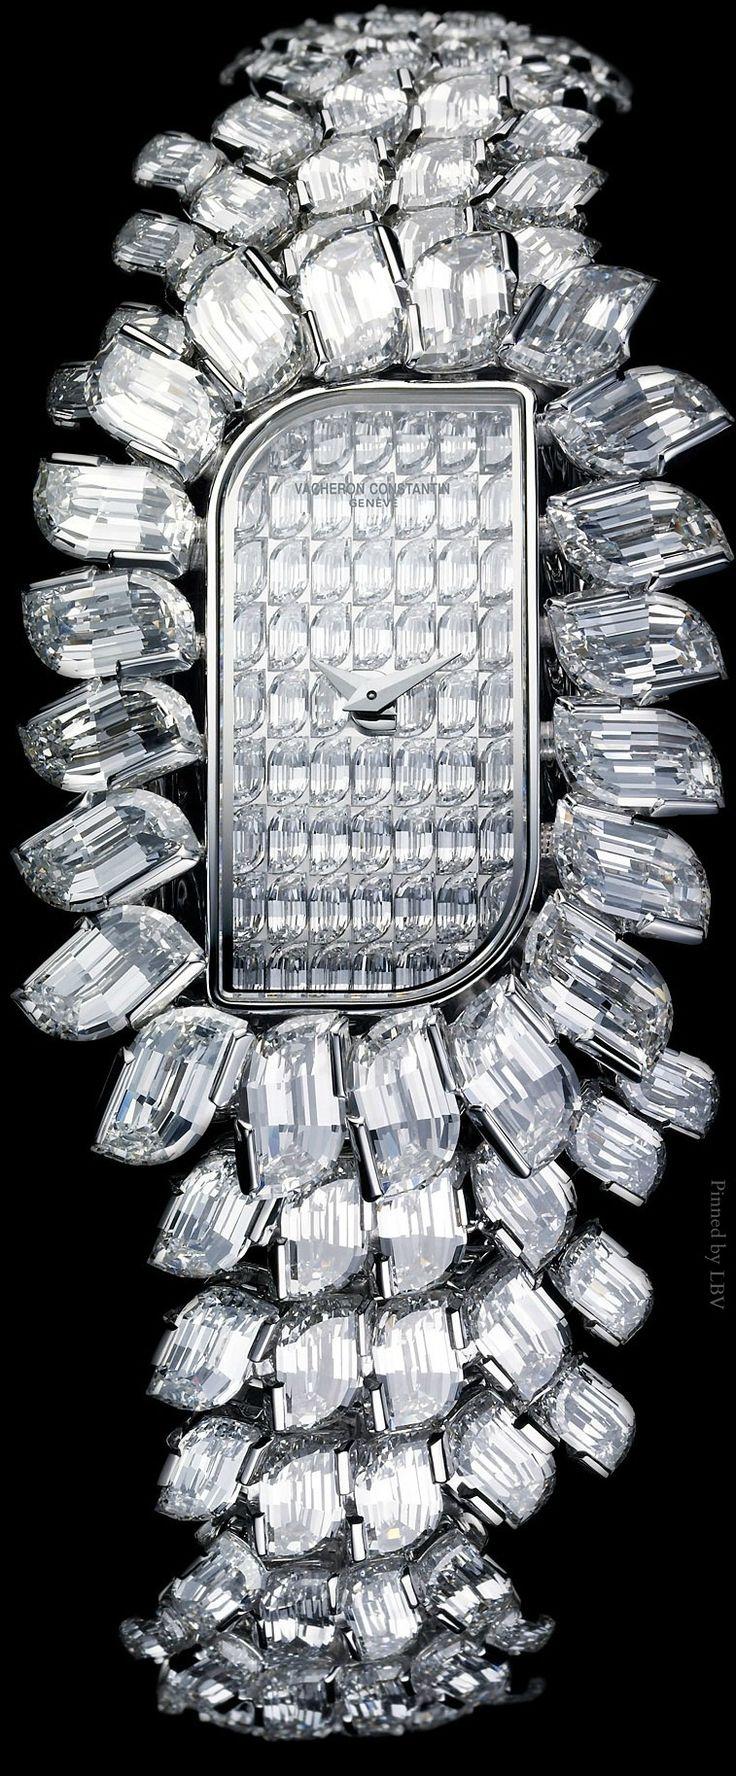 Vacheron Constantin Lady Kalla Flame | LBV ♥✤ | BeStayBeautiful